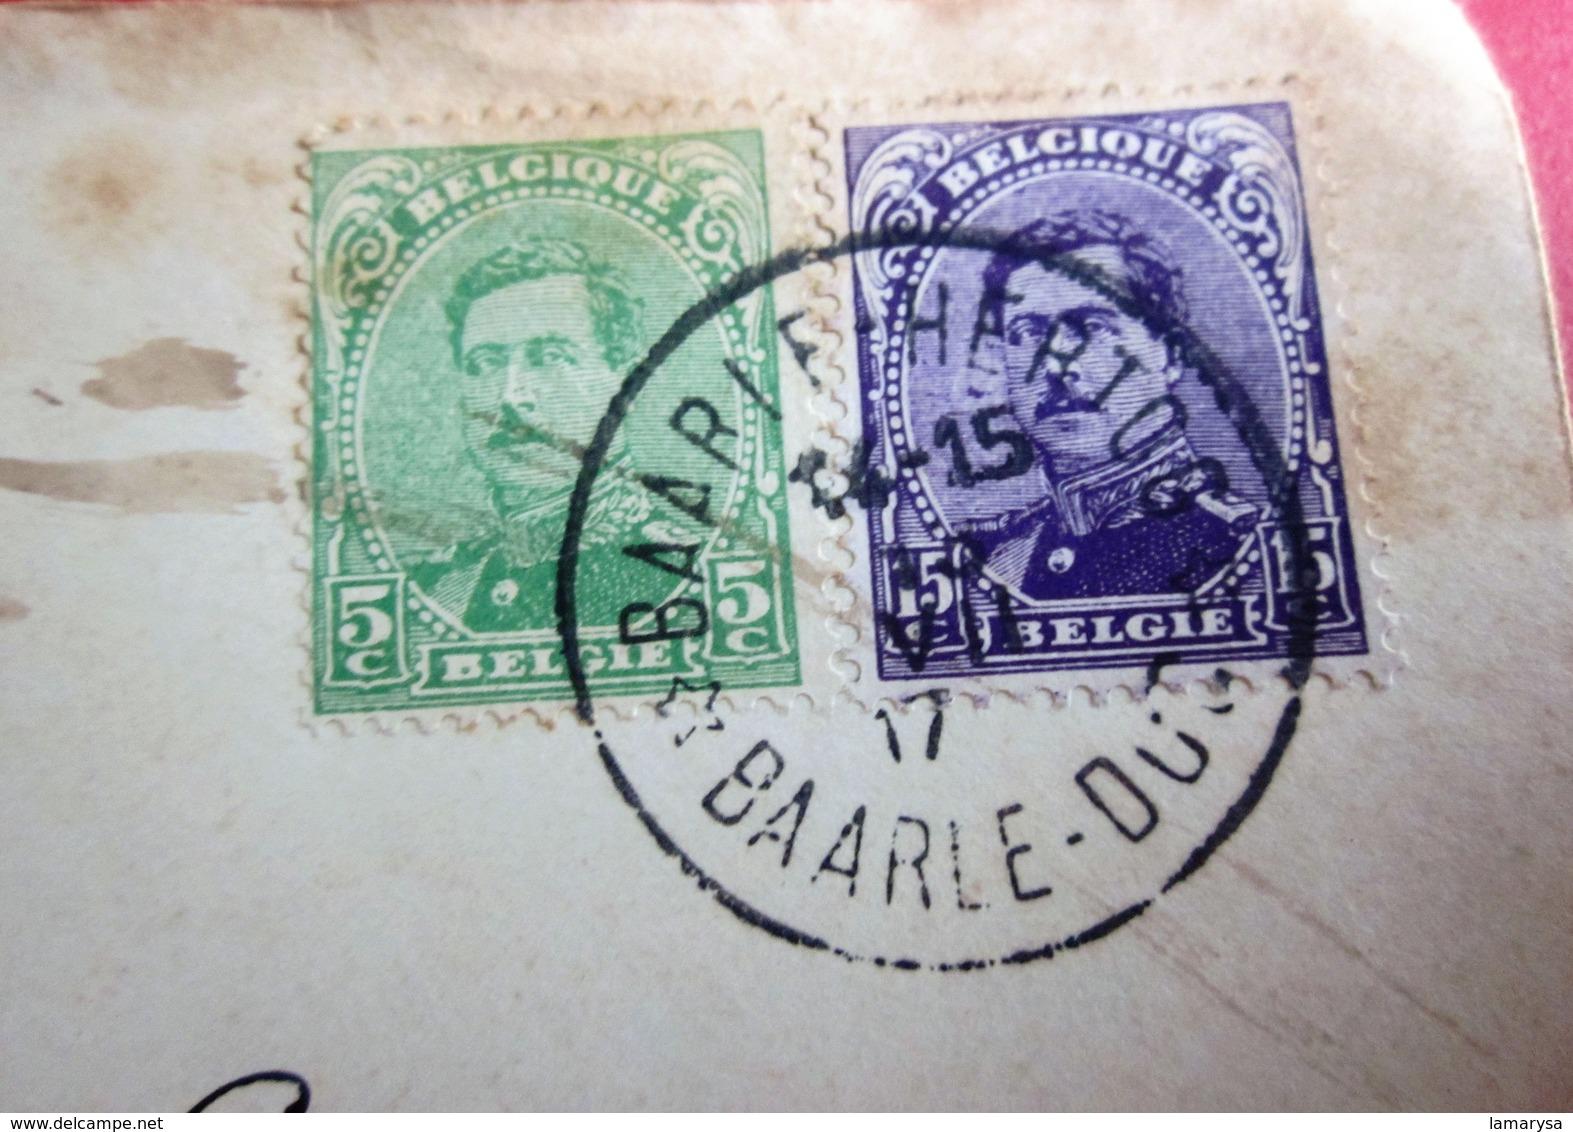 1917 WW I  - ENCLAVE BELGE BAARLE DUC VIA LA HAYE HOLLANDE Guerre 14-18 Timbres Europe Belgique 1917 Albert I- INVASION - WW I